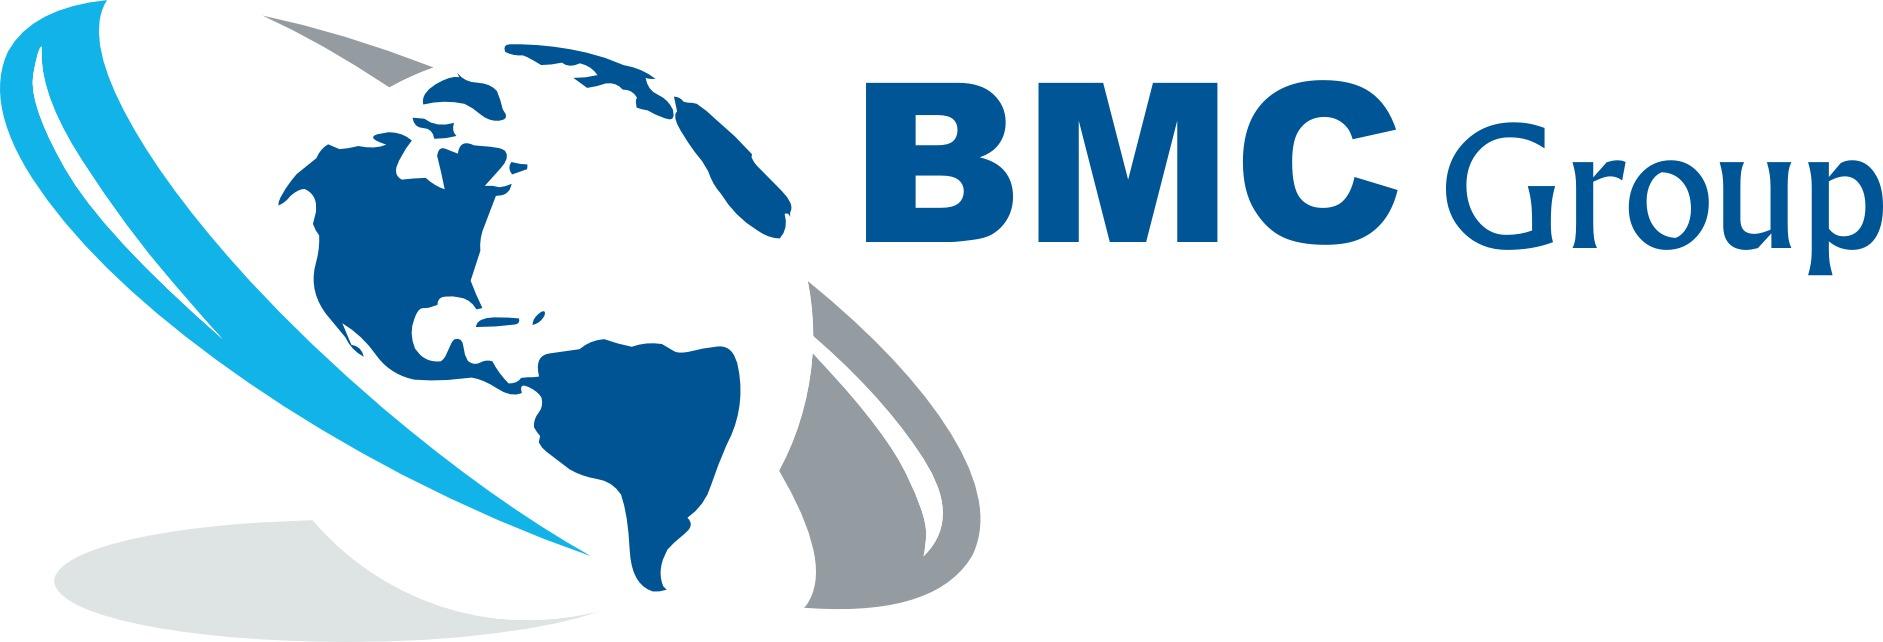 BMC Group